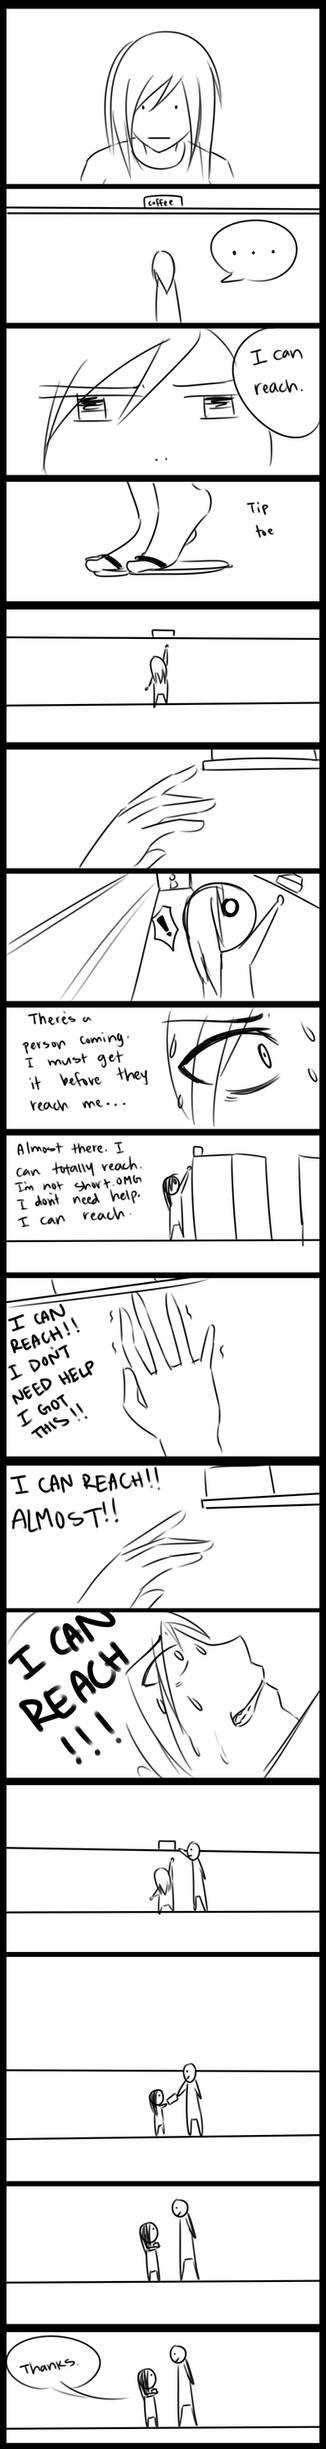 Shorty struggles